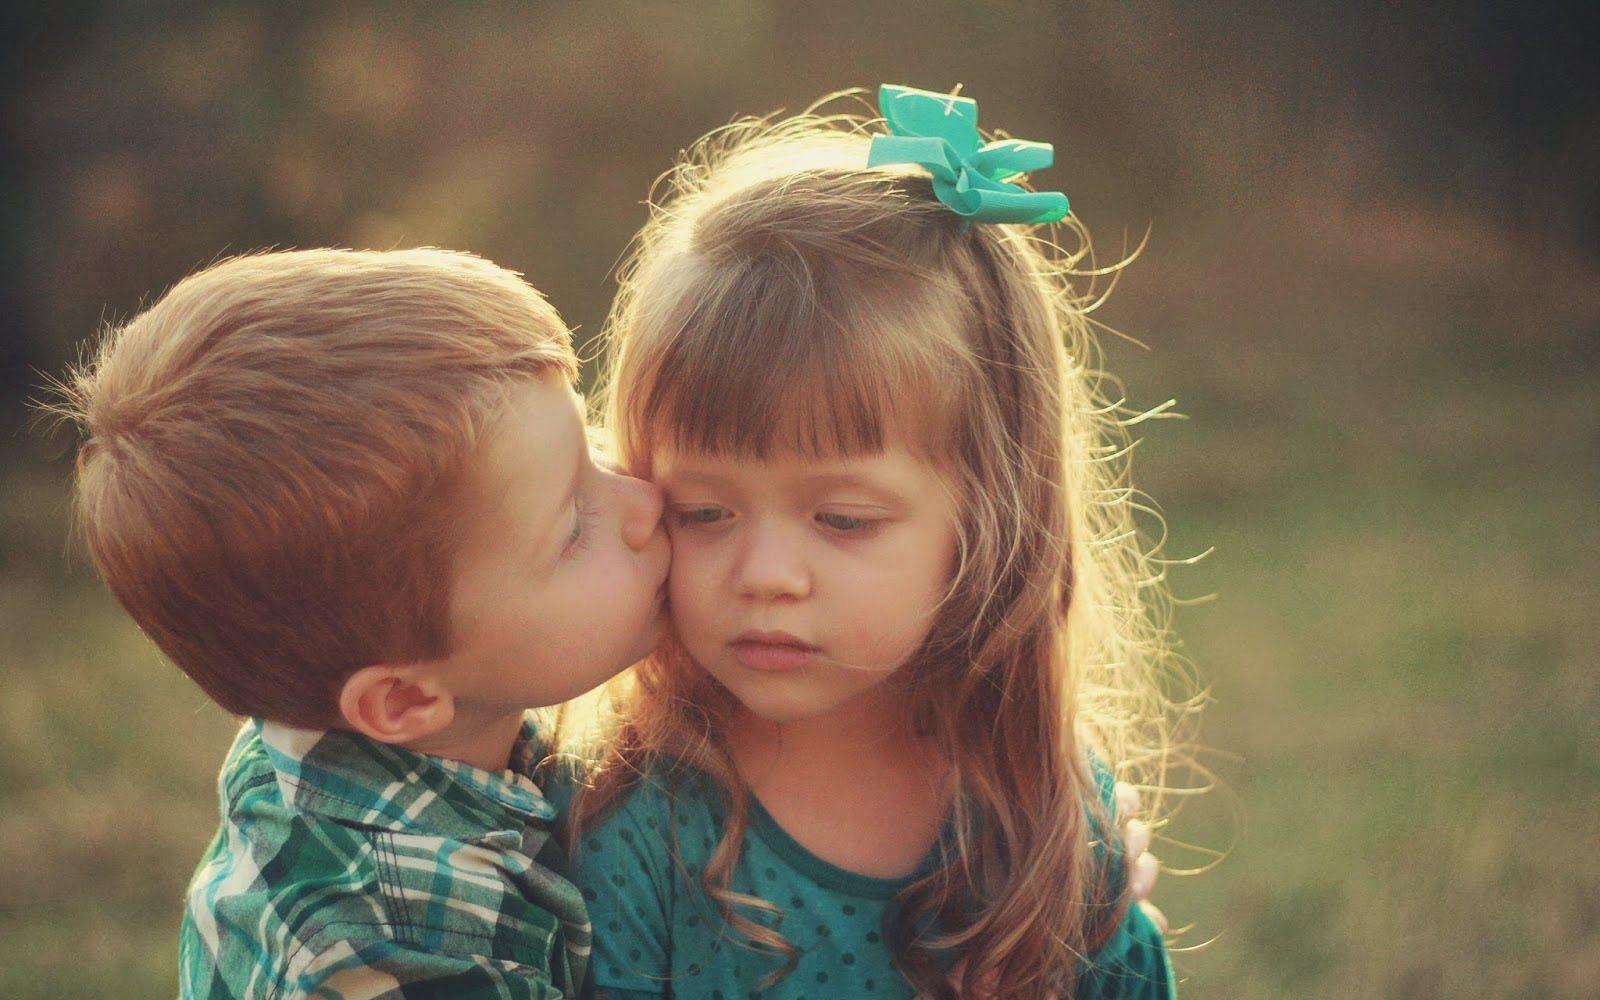 kids kisses wallpapers: Children Love Wallpapers